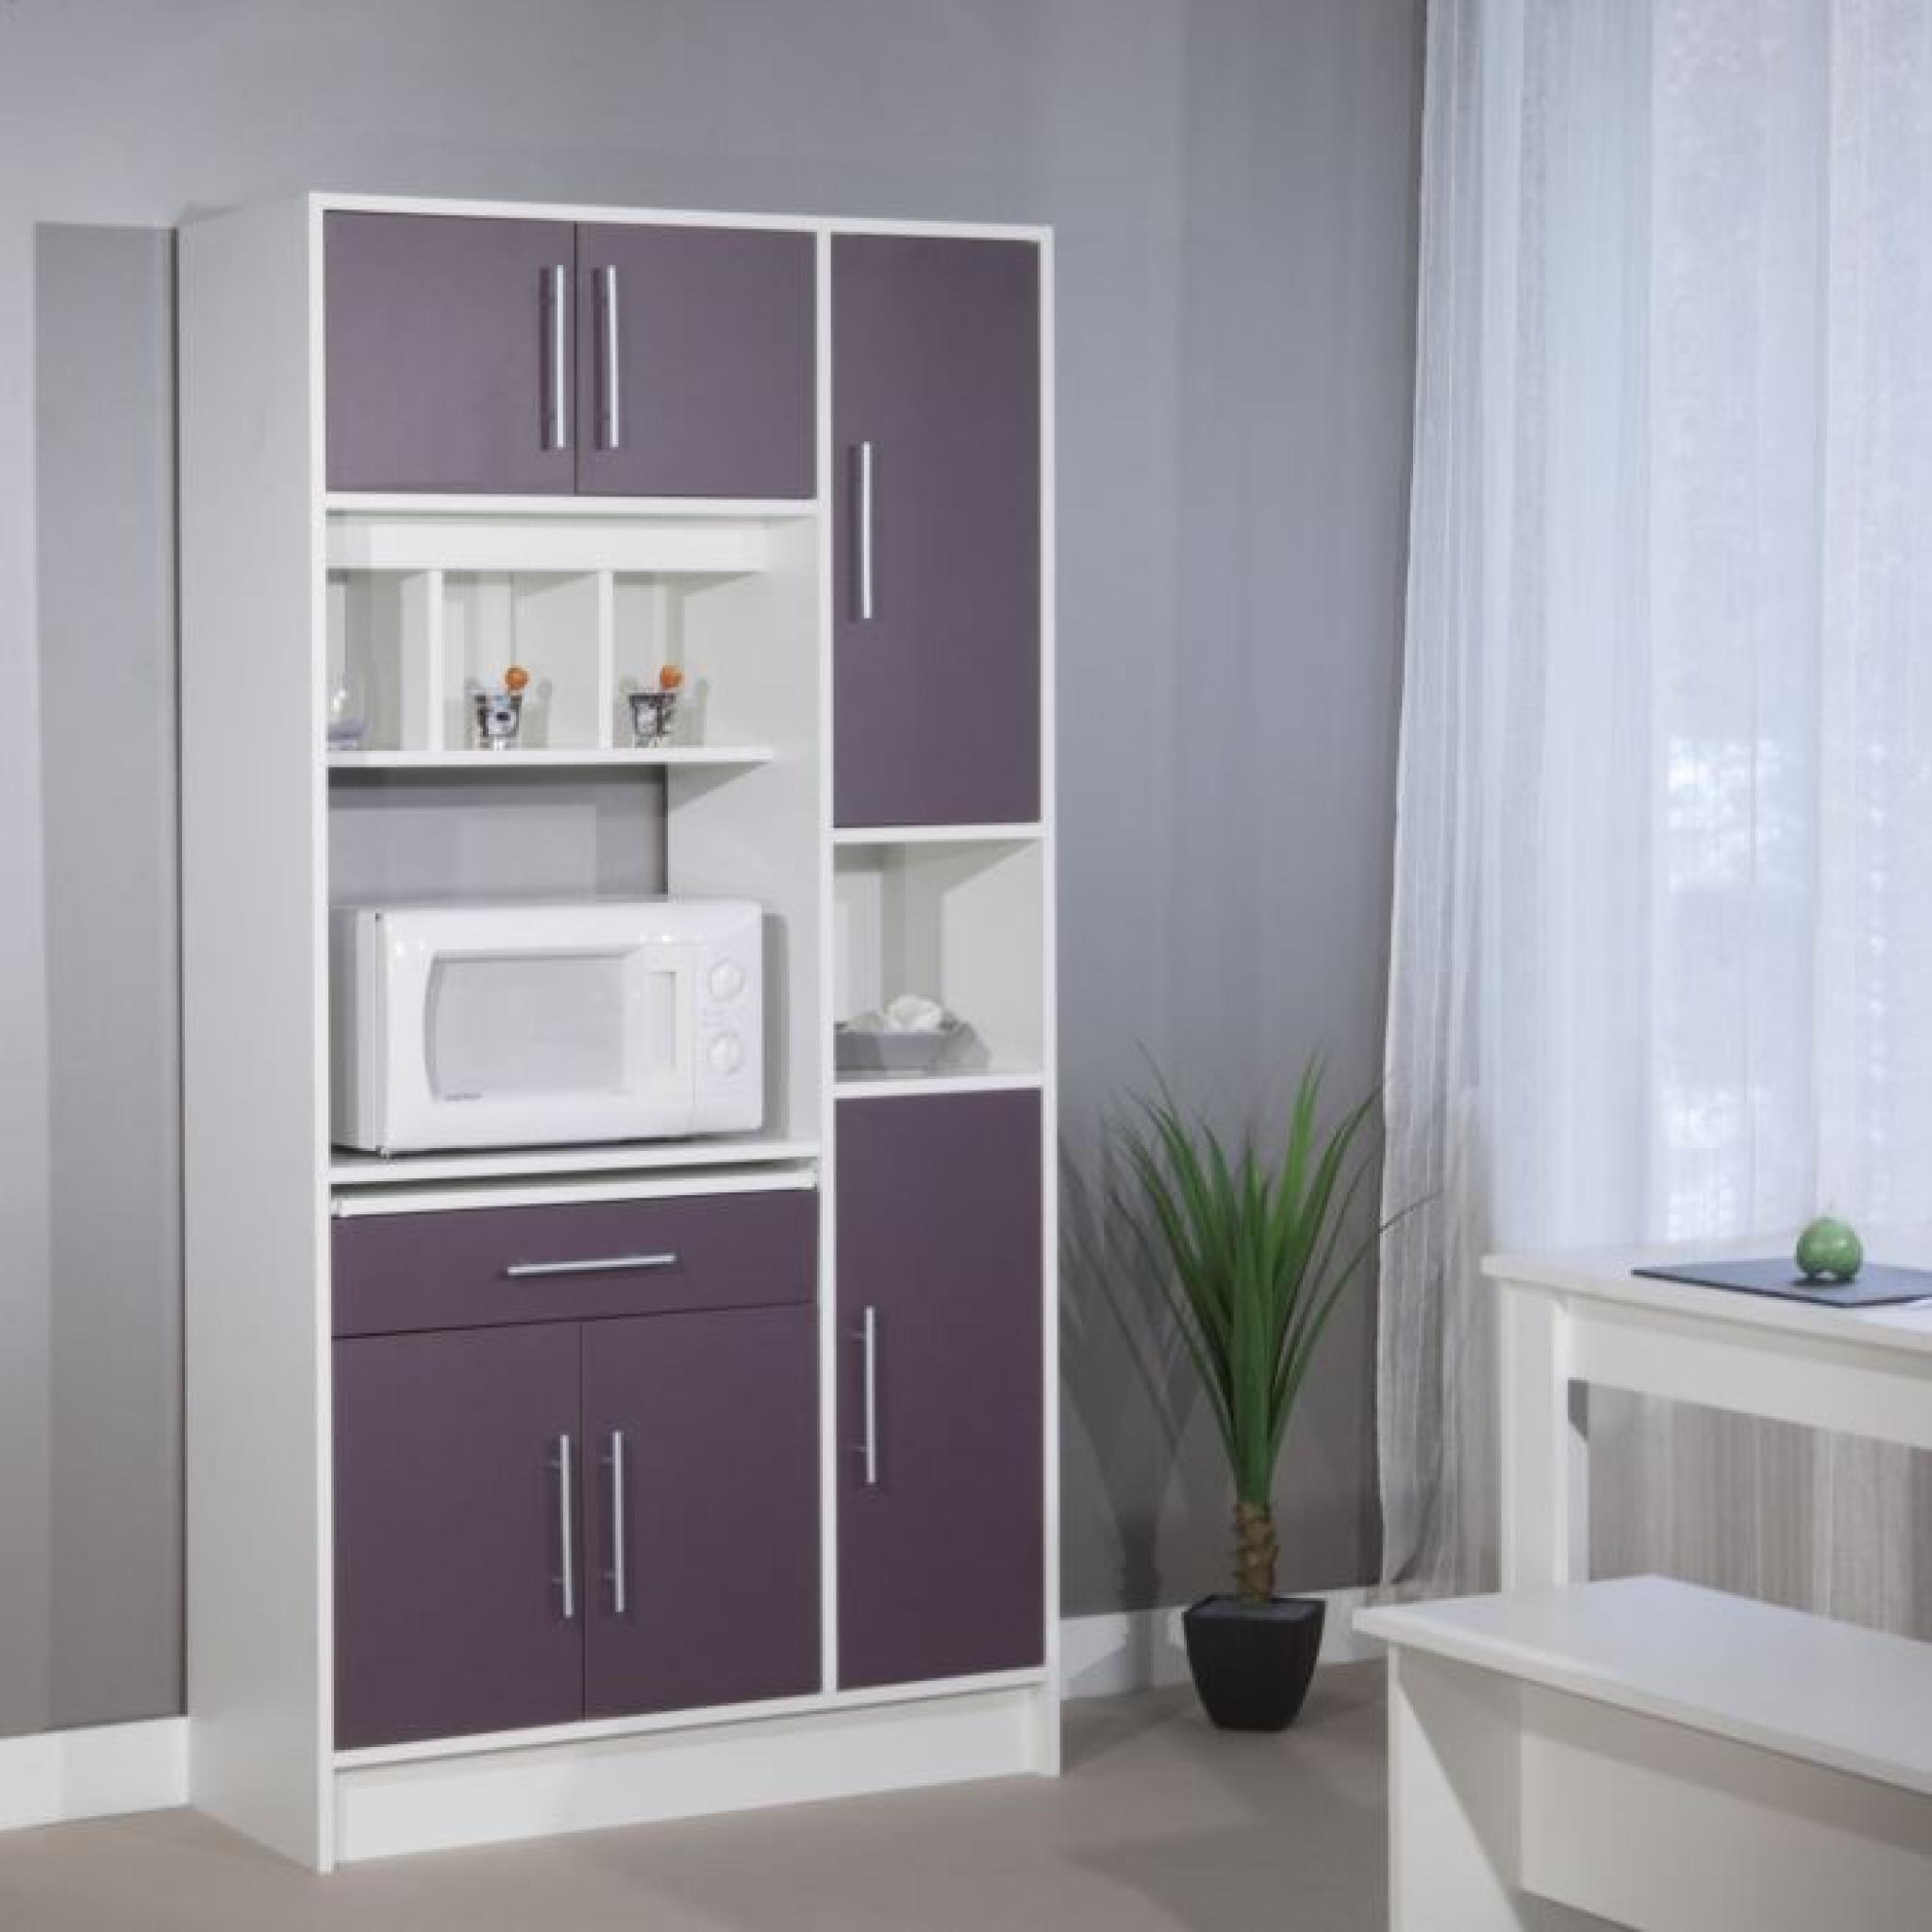 pepper buffet de cuisine 88cm aubergine achat vente. Black Bedroom Furniture Sets. Home Design Ideas